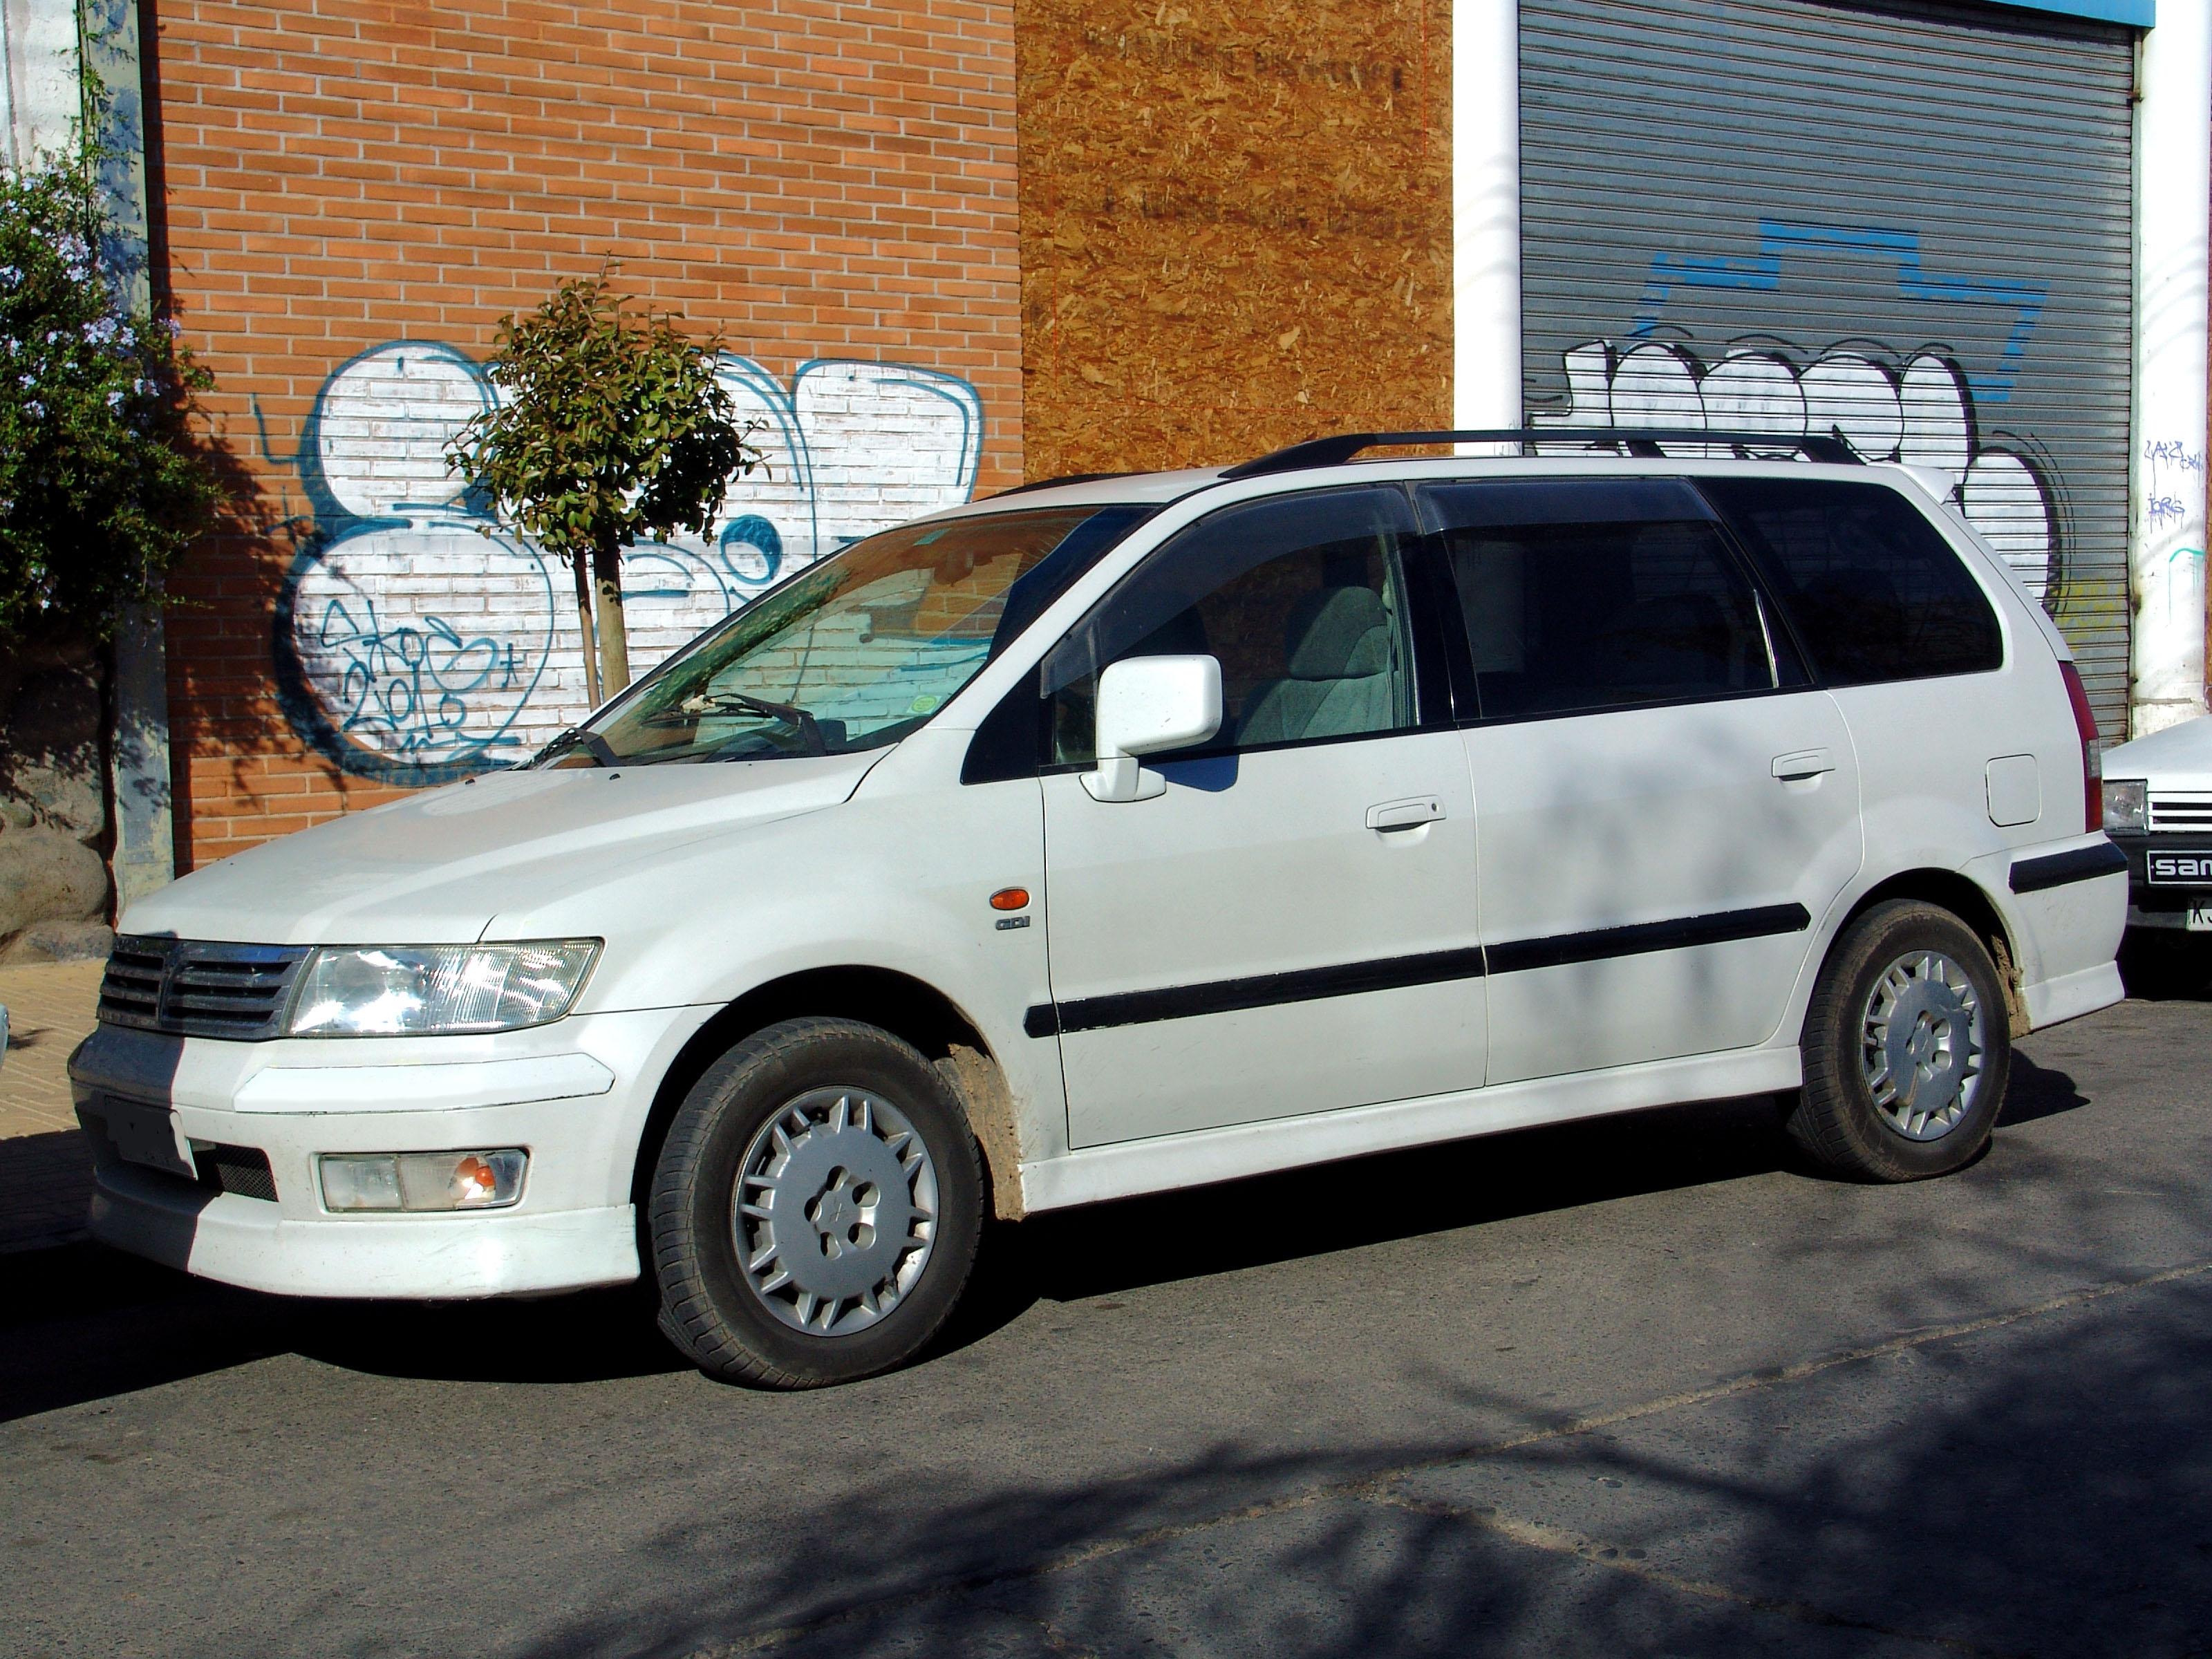 file mitsubishi chariot grandis super exceed gdi 1998 12060142643 rh commons wikimedia org Grandis Mitsubishi DVD Player Mitsubishi Grandis 2005